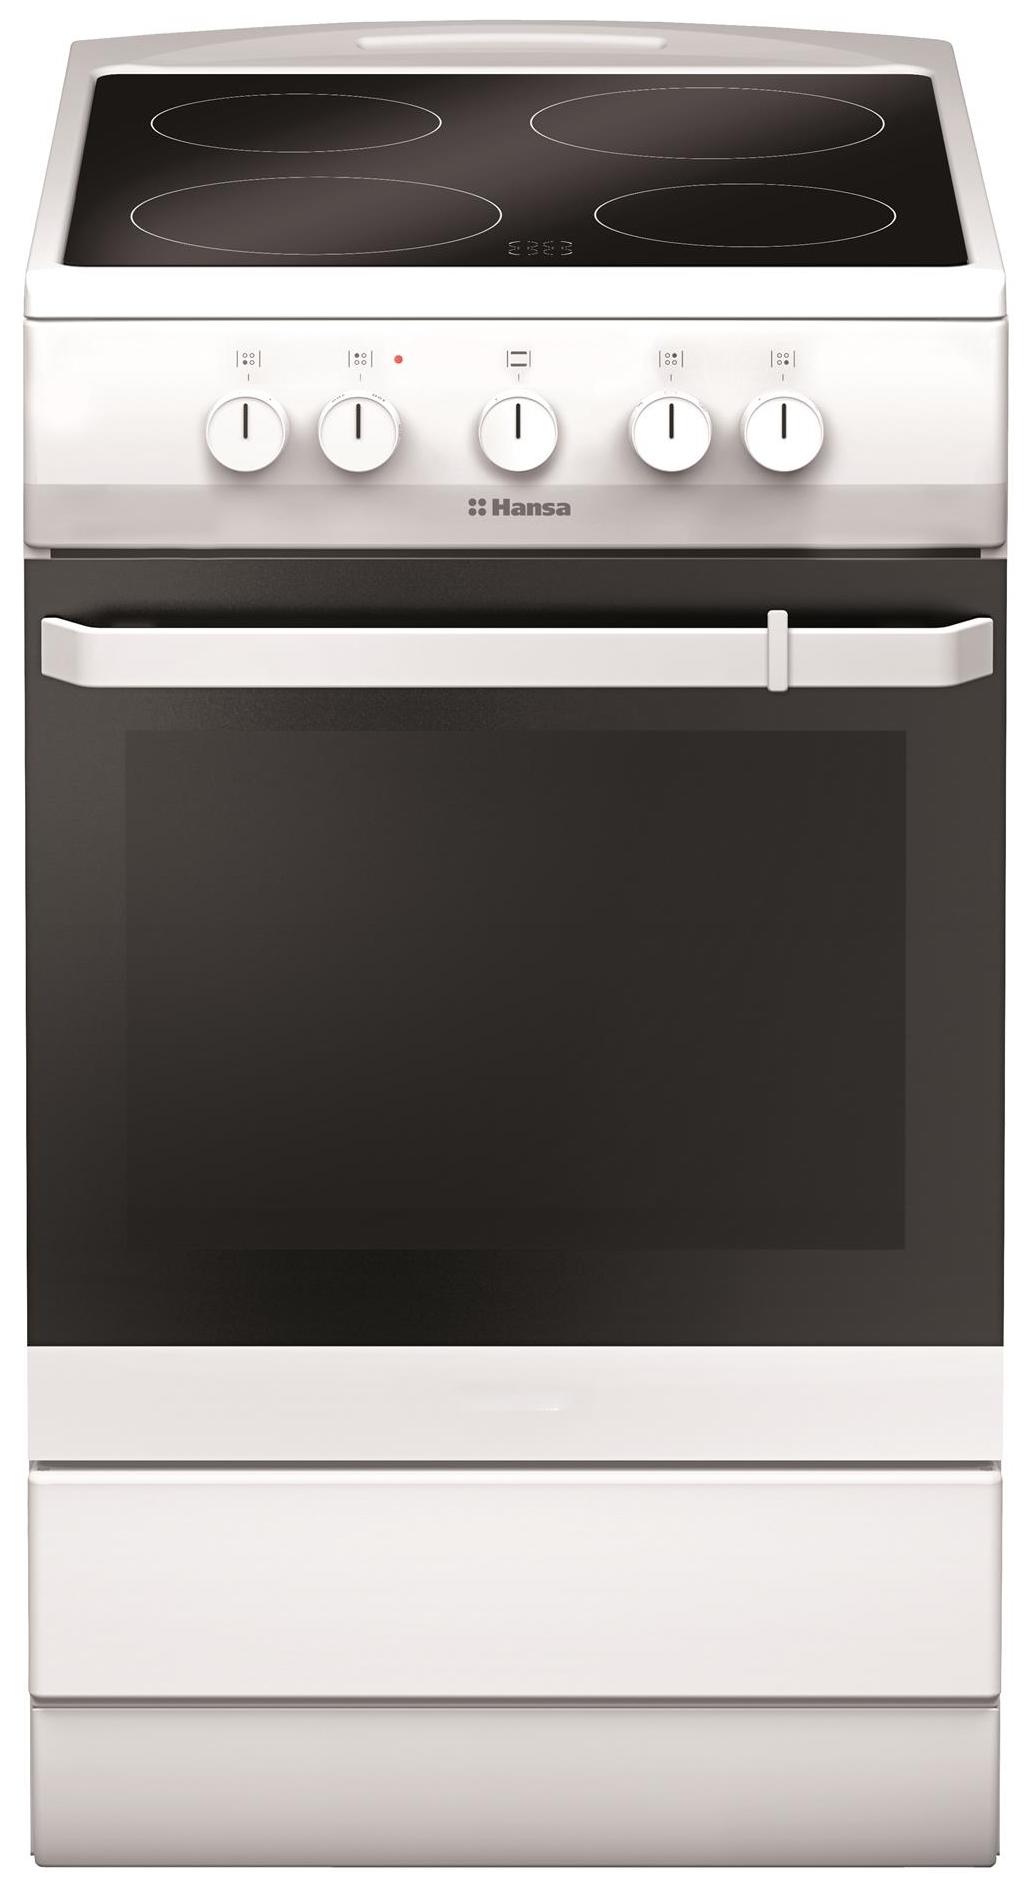 Электрическая плита Hansa FCCW54000 White